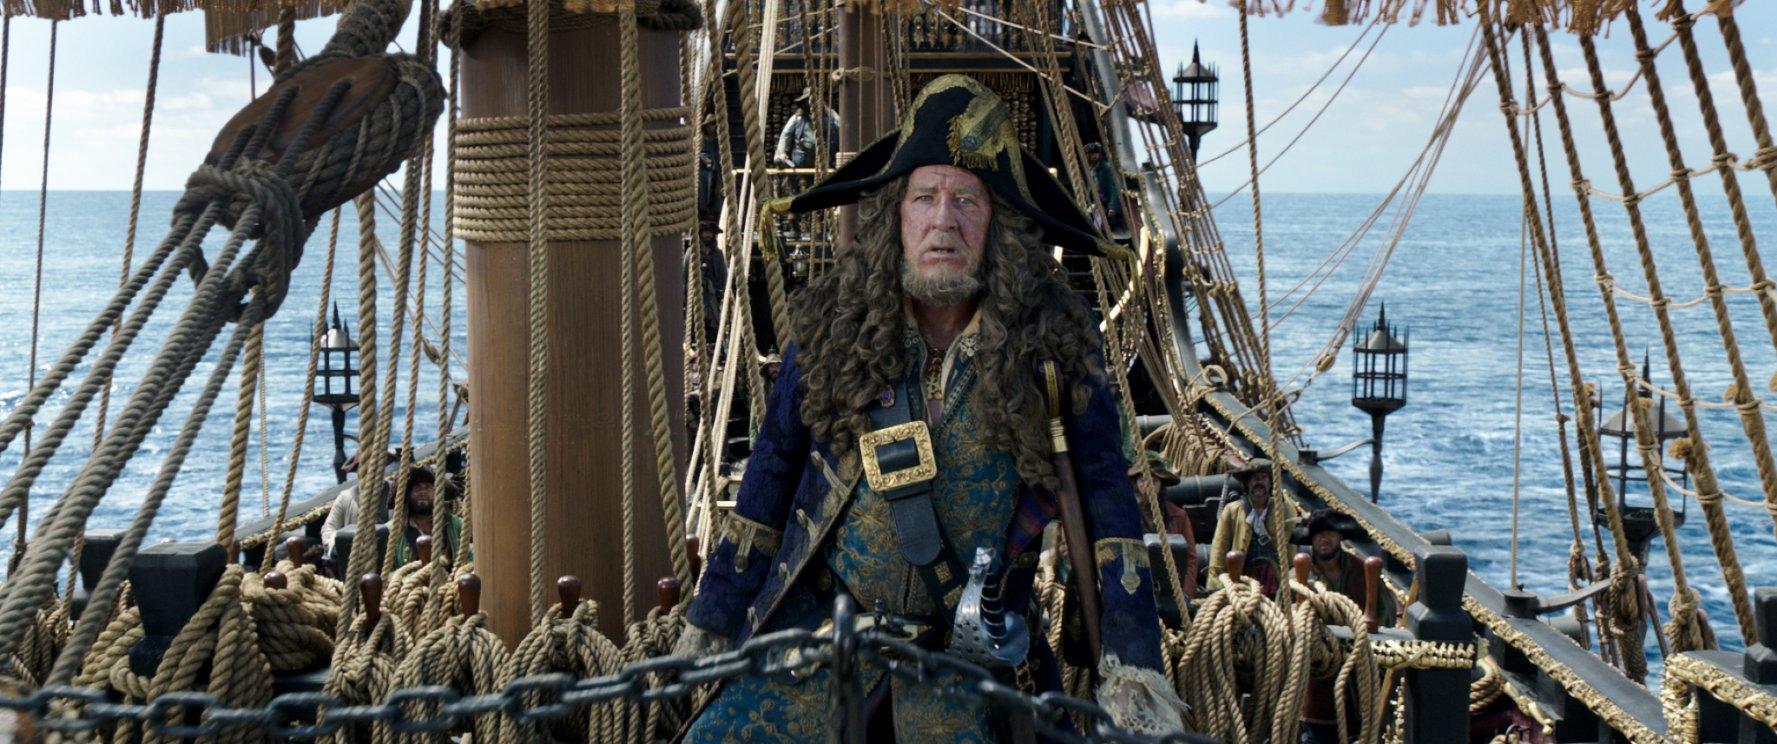 (5) film-piratite-od-karibite-odmazdata-na-salazar-pirates-of-the-caribbean-dead-men-tell-no-tales-www.kafepauza.mk